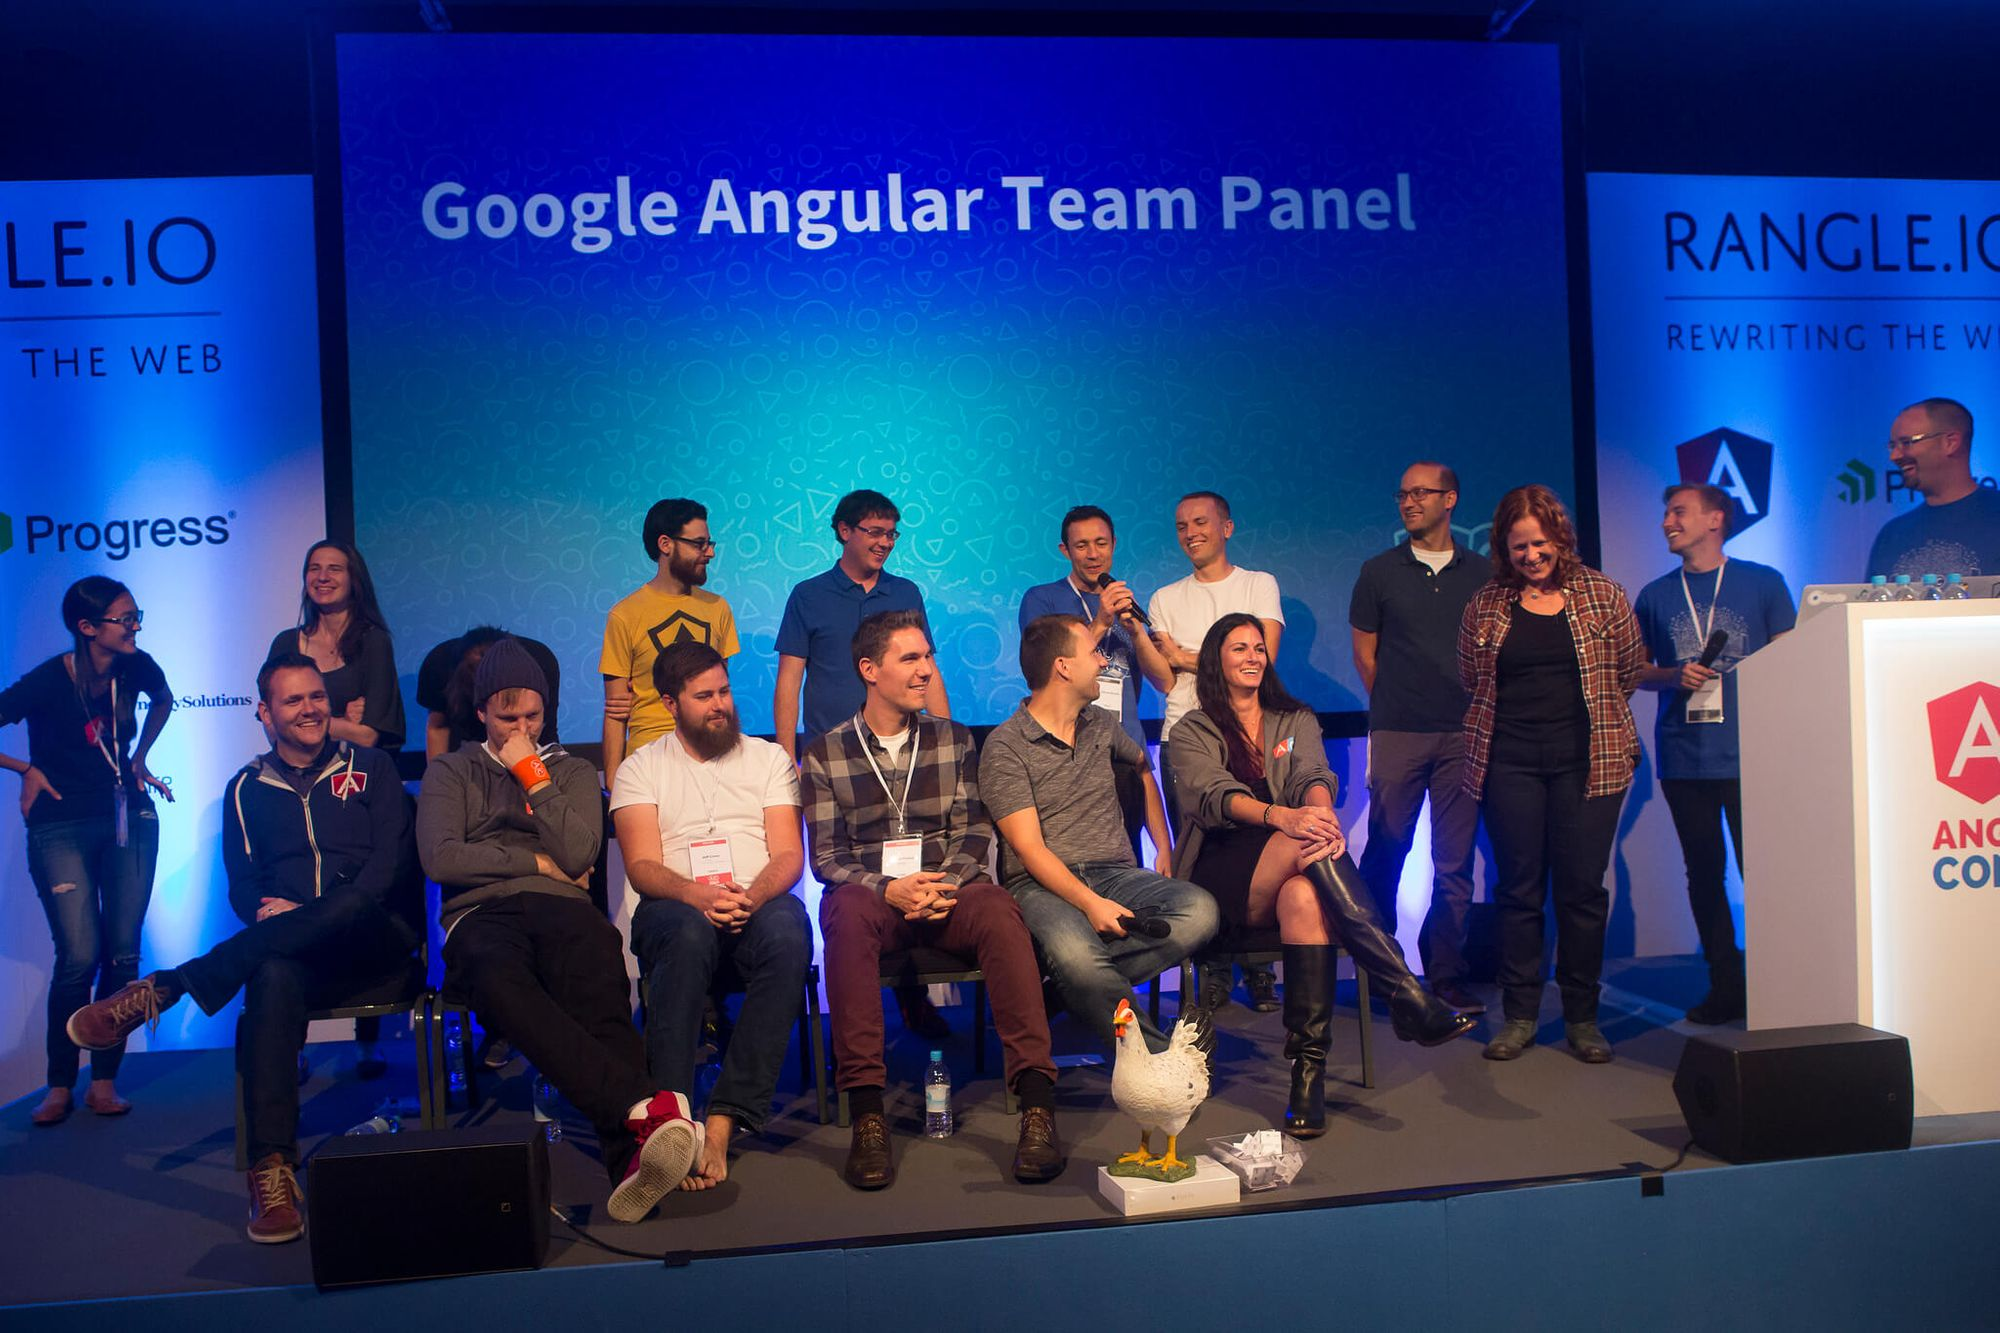 Google angular team panel